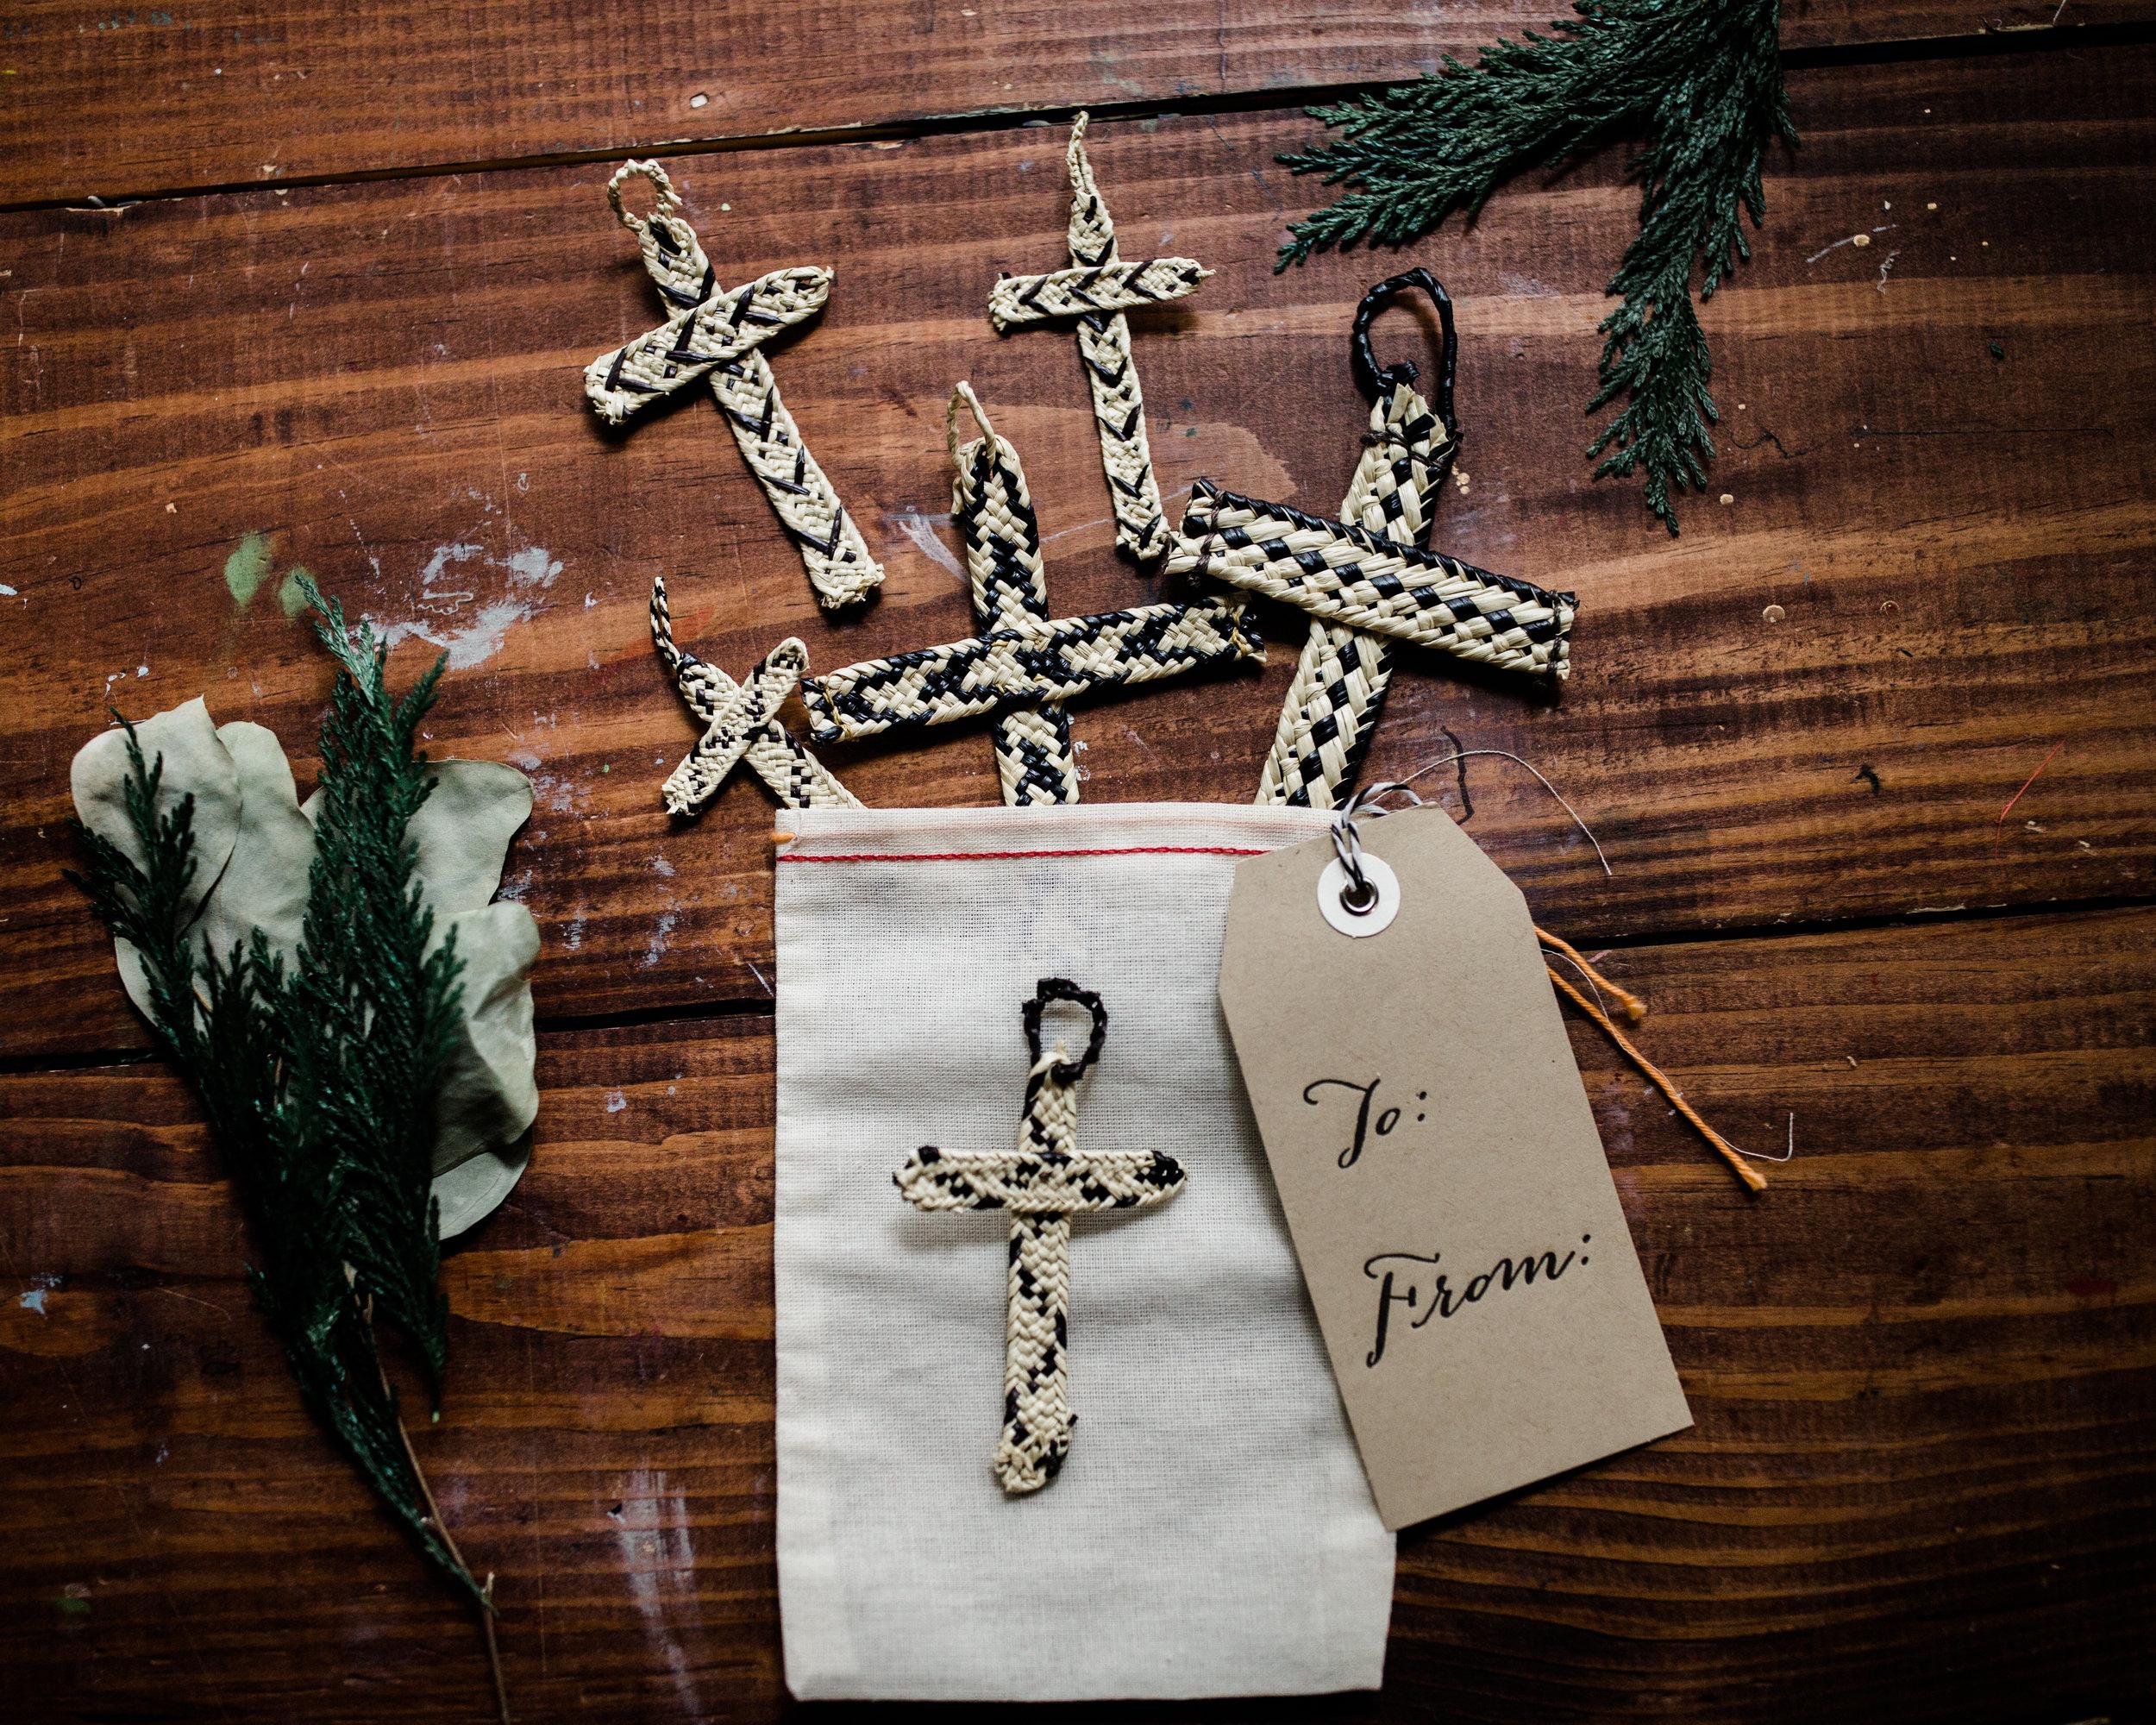 hands-producing-hope-costa-rica-christmas-crosses-0099.jpg